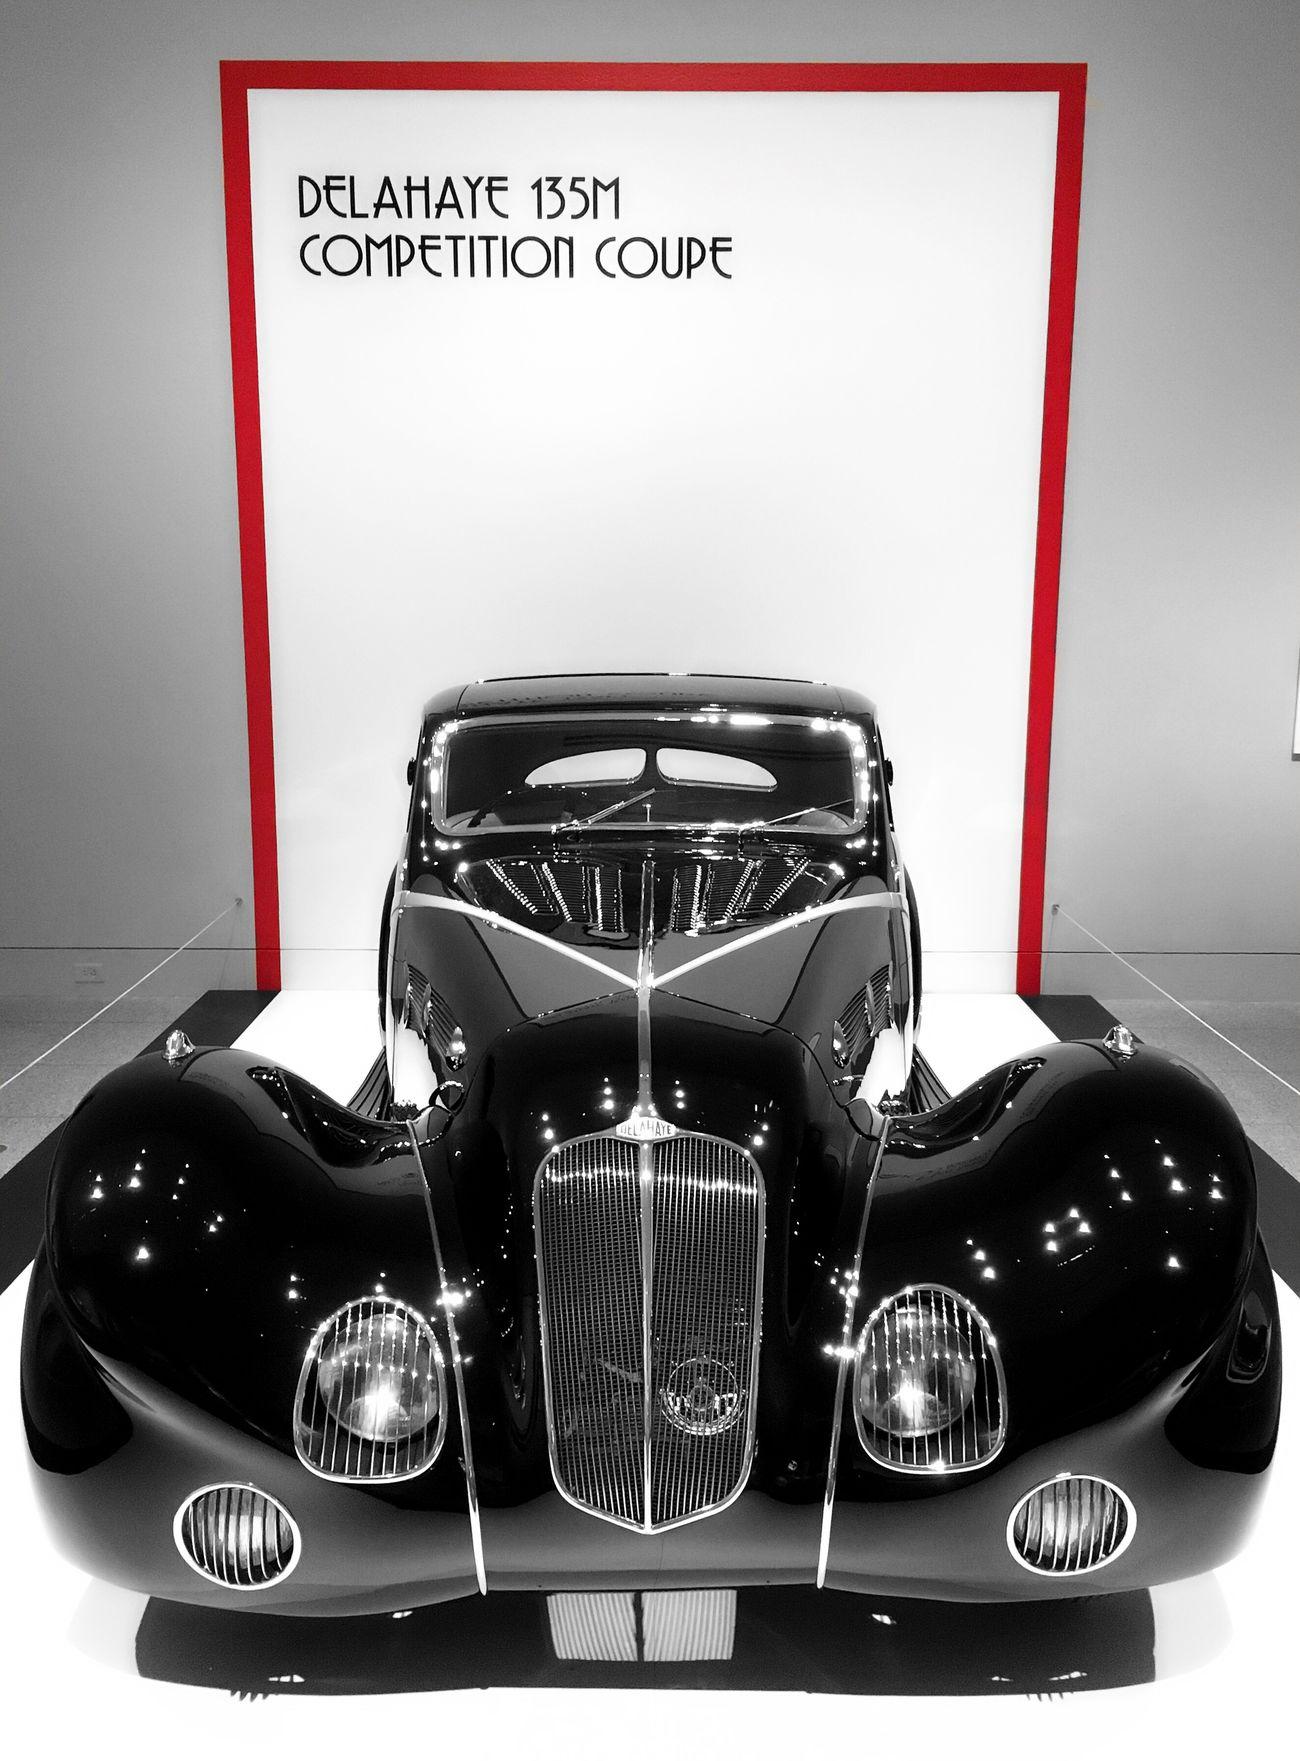 Car Classic Car Vintage Sculpted Vintage Car Automobile Retro Car Streamlined Art Deco Art Deco Design Sculpted Metal Sculpted In Steel Museum Piece Retro EyeEmNewHere EyeEm Best Shots Retro Style Collector's Car Transportation Wheels Industrial Design